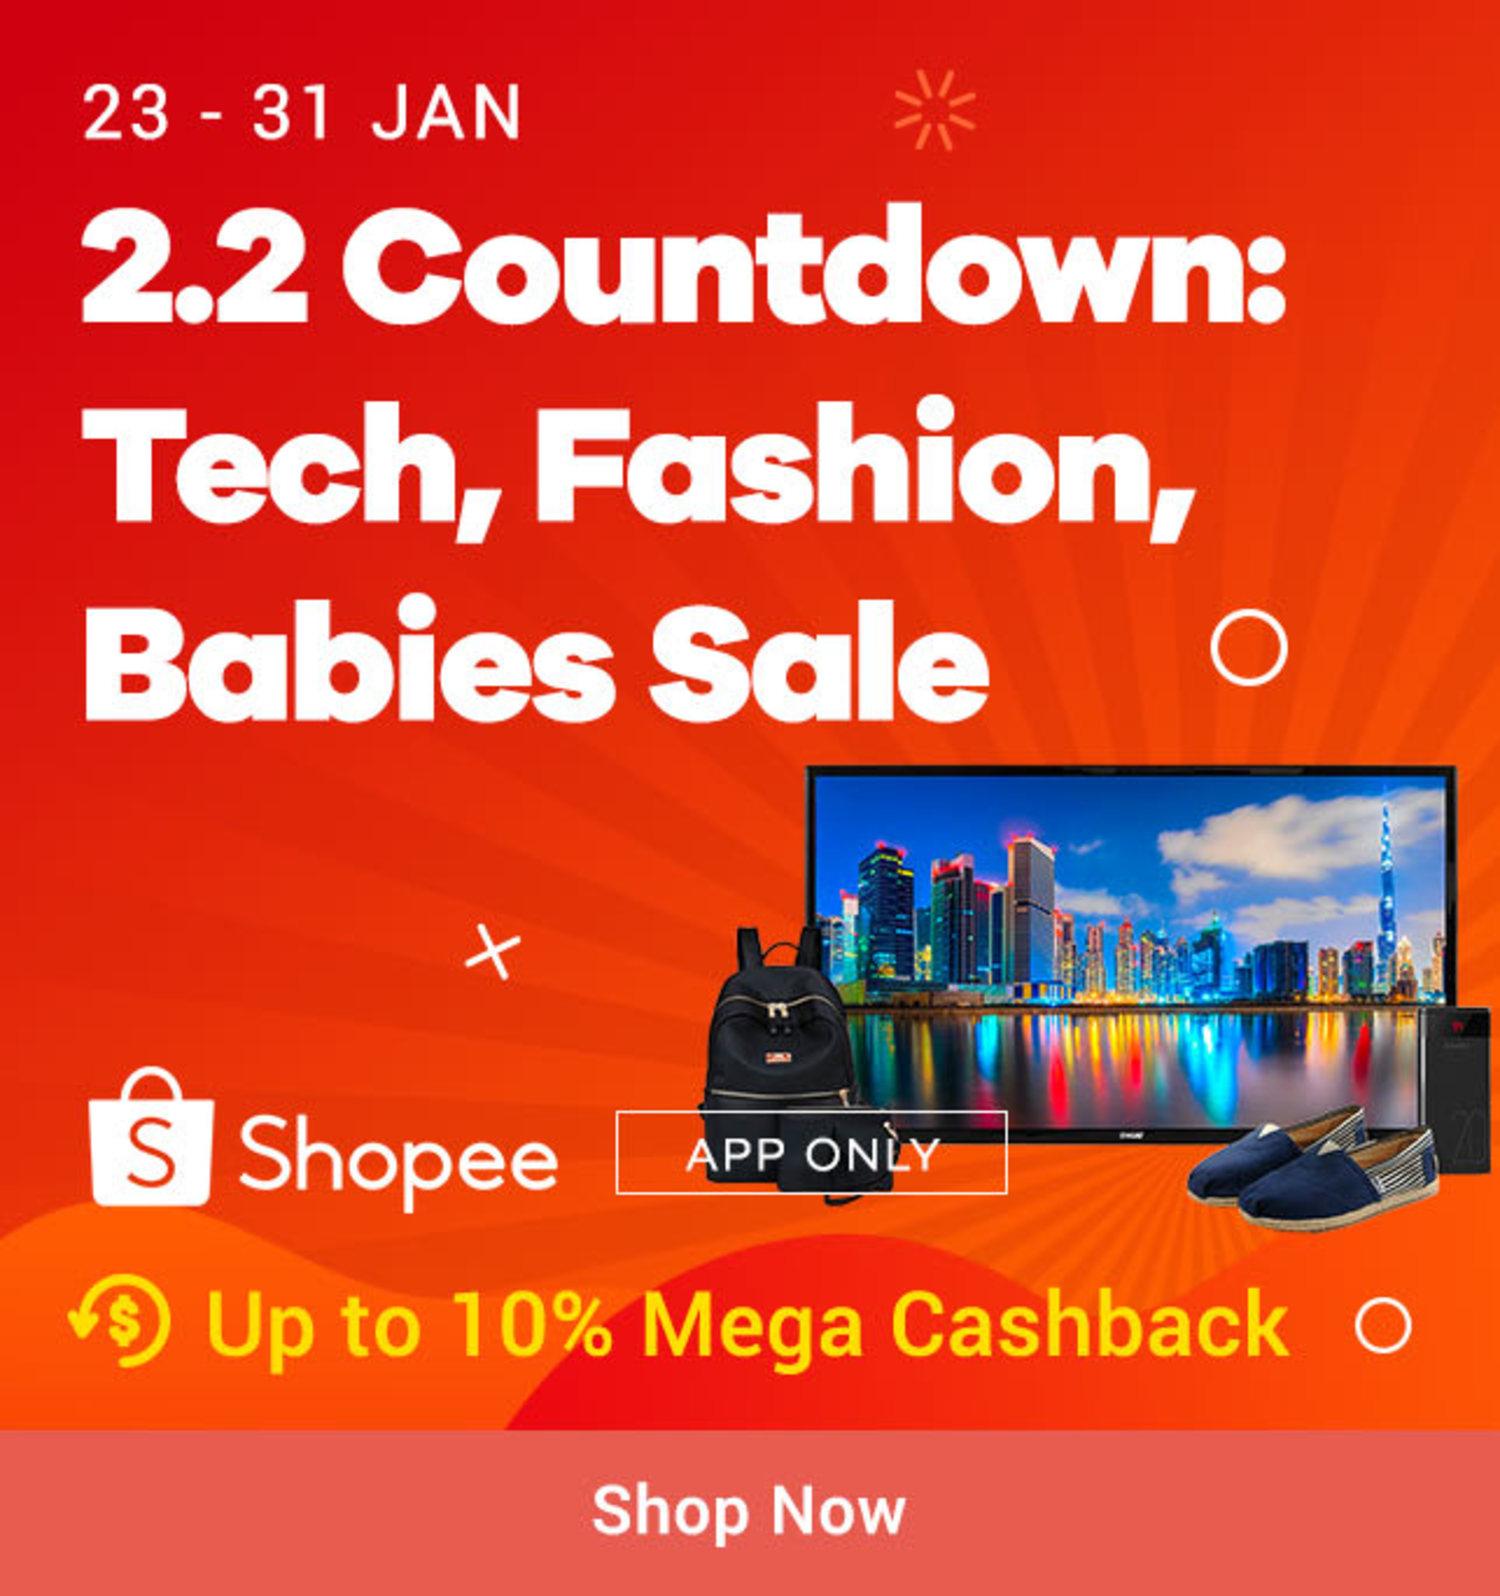 Shopee 2.2 Countdown: Tech, Fashion Babies Sale